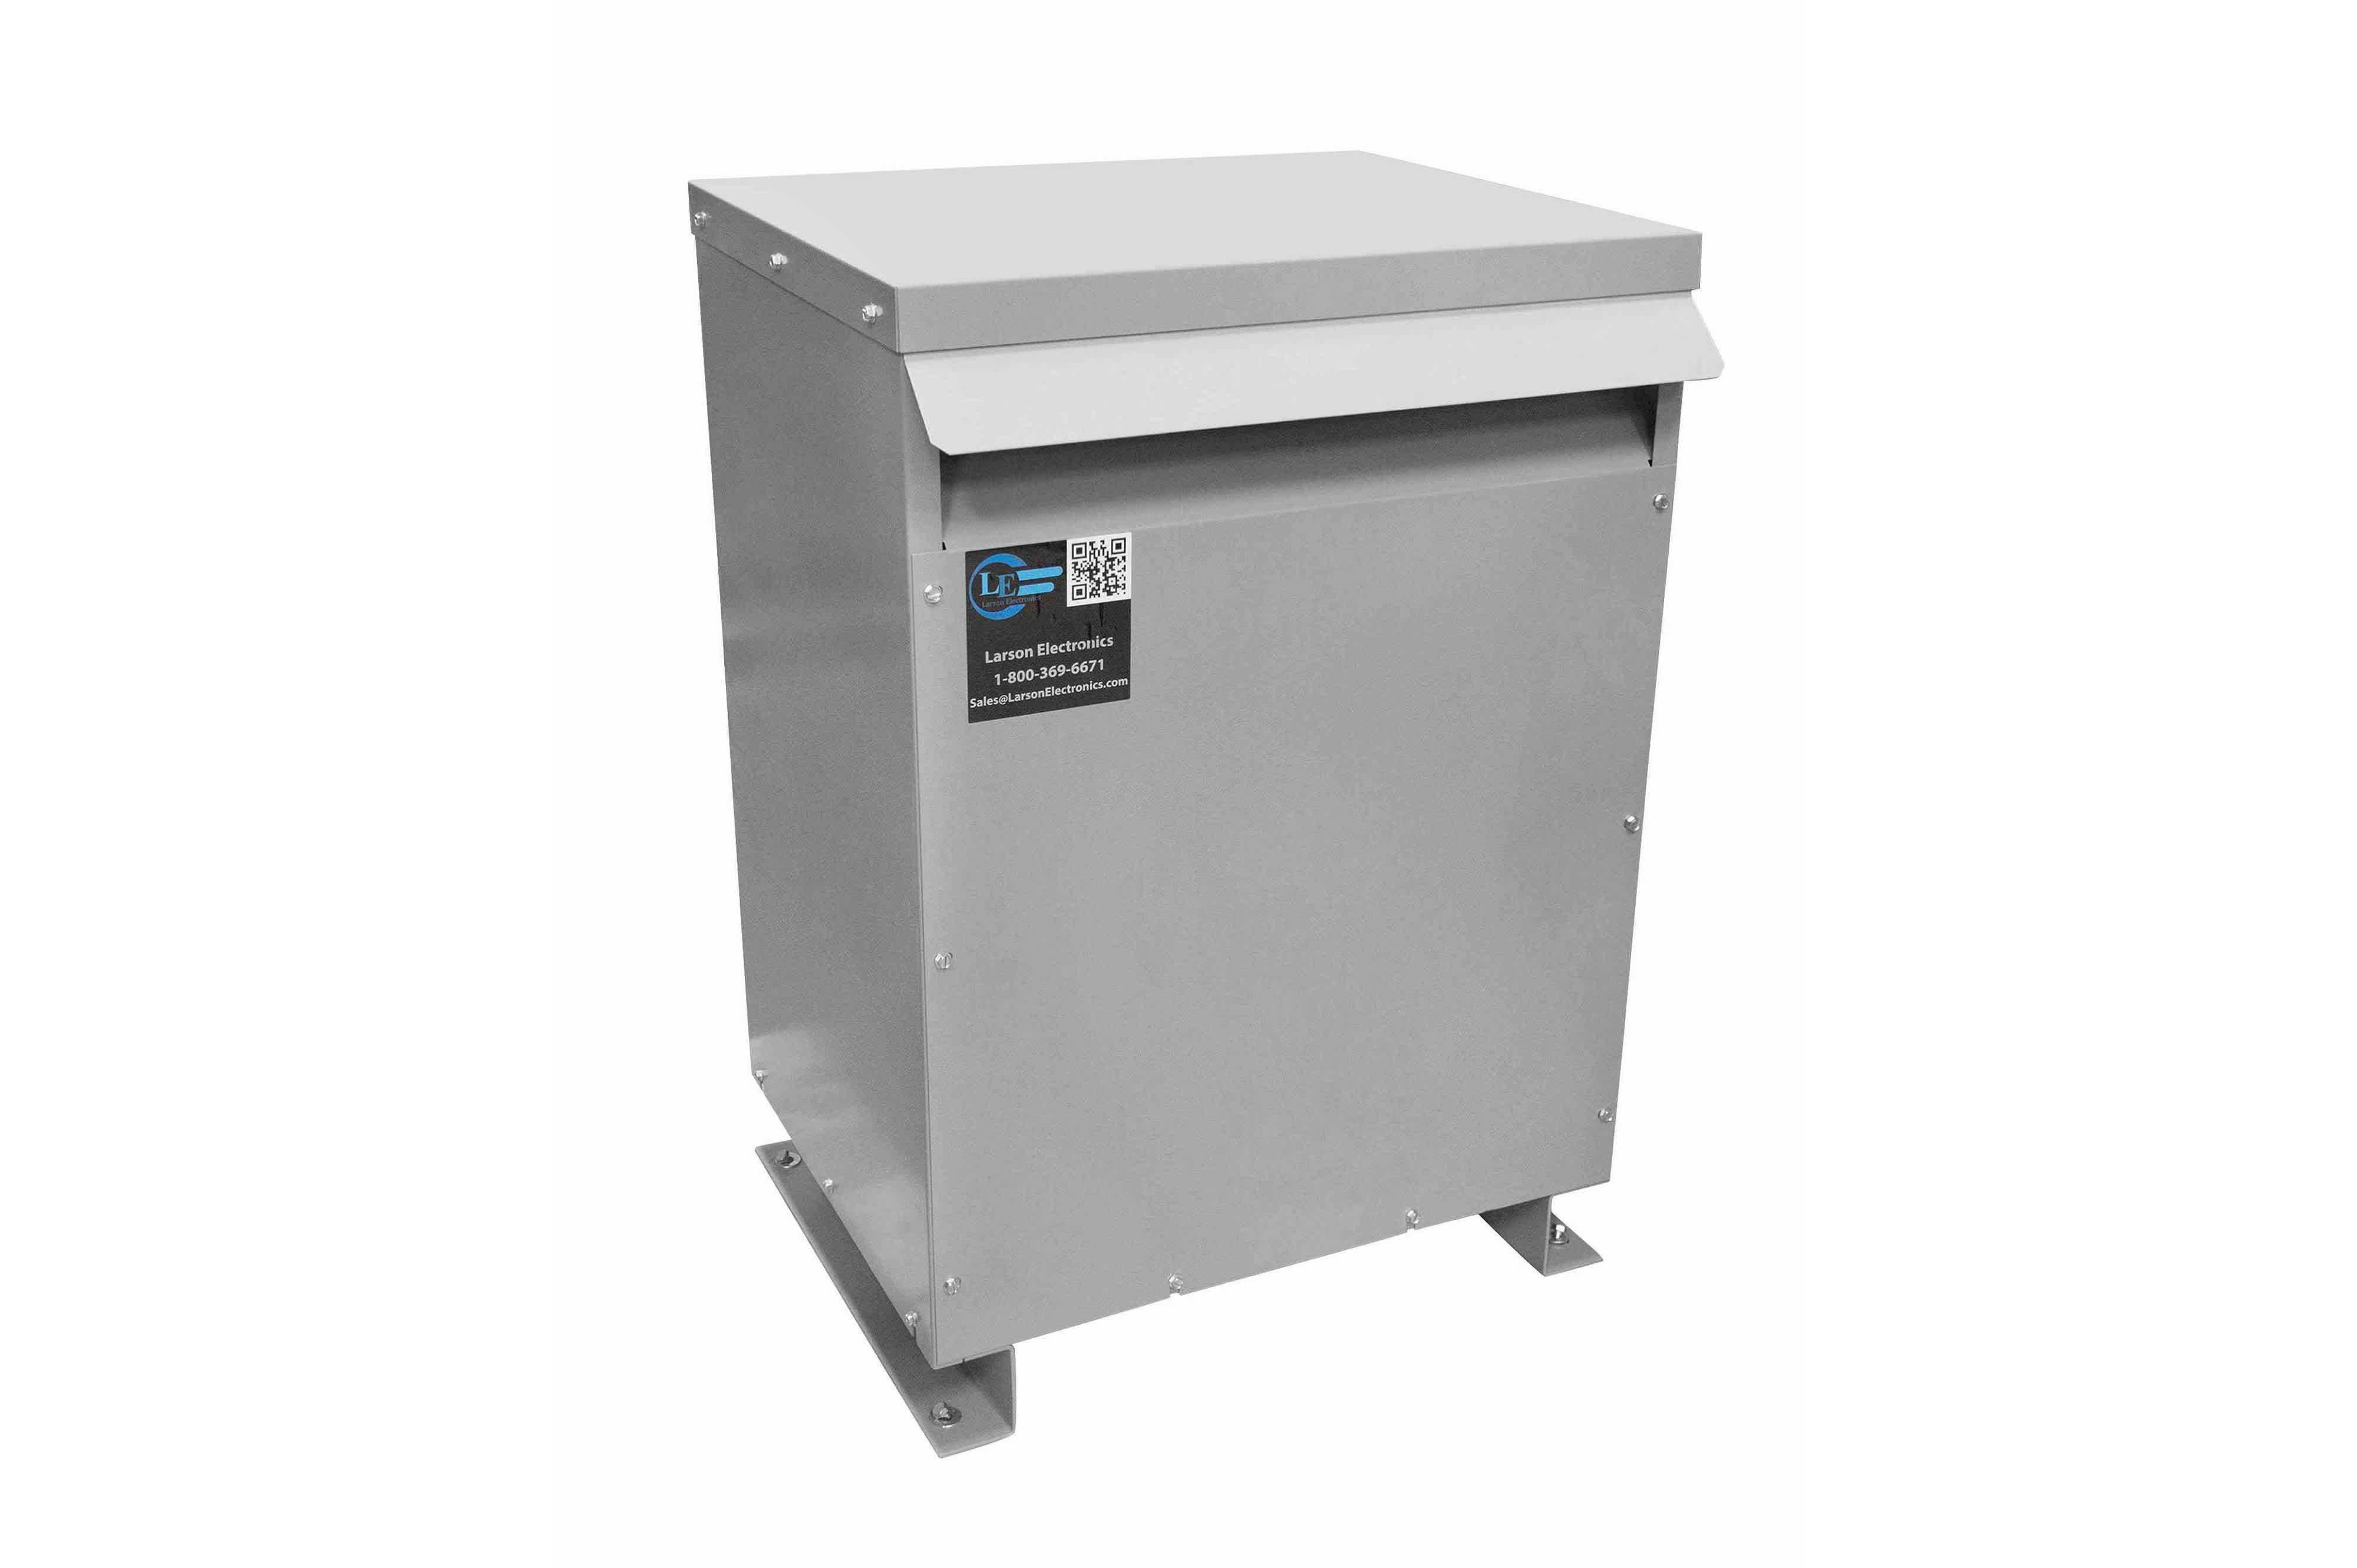 115 kVA 3PH Isolation Transformer, 480V Wye Primary, 600Y/347 Wye-N Secondary, N3R, Ventilated, 60 Hz